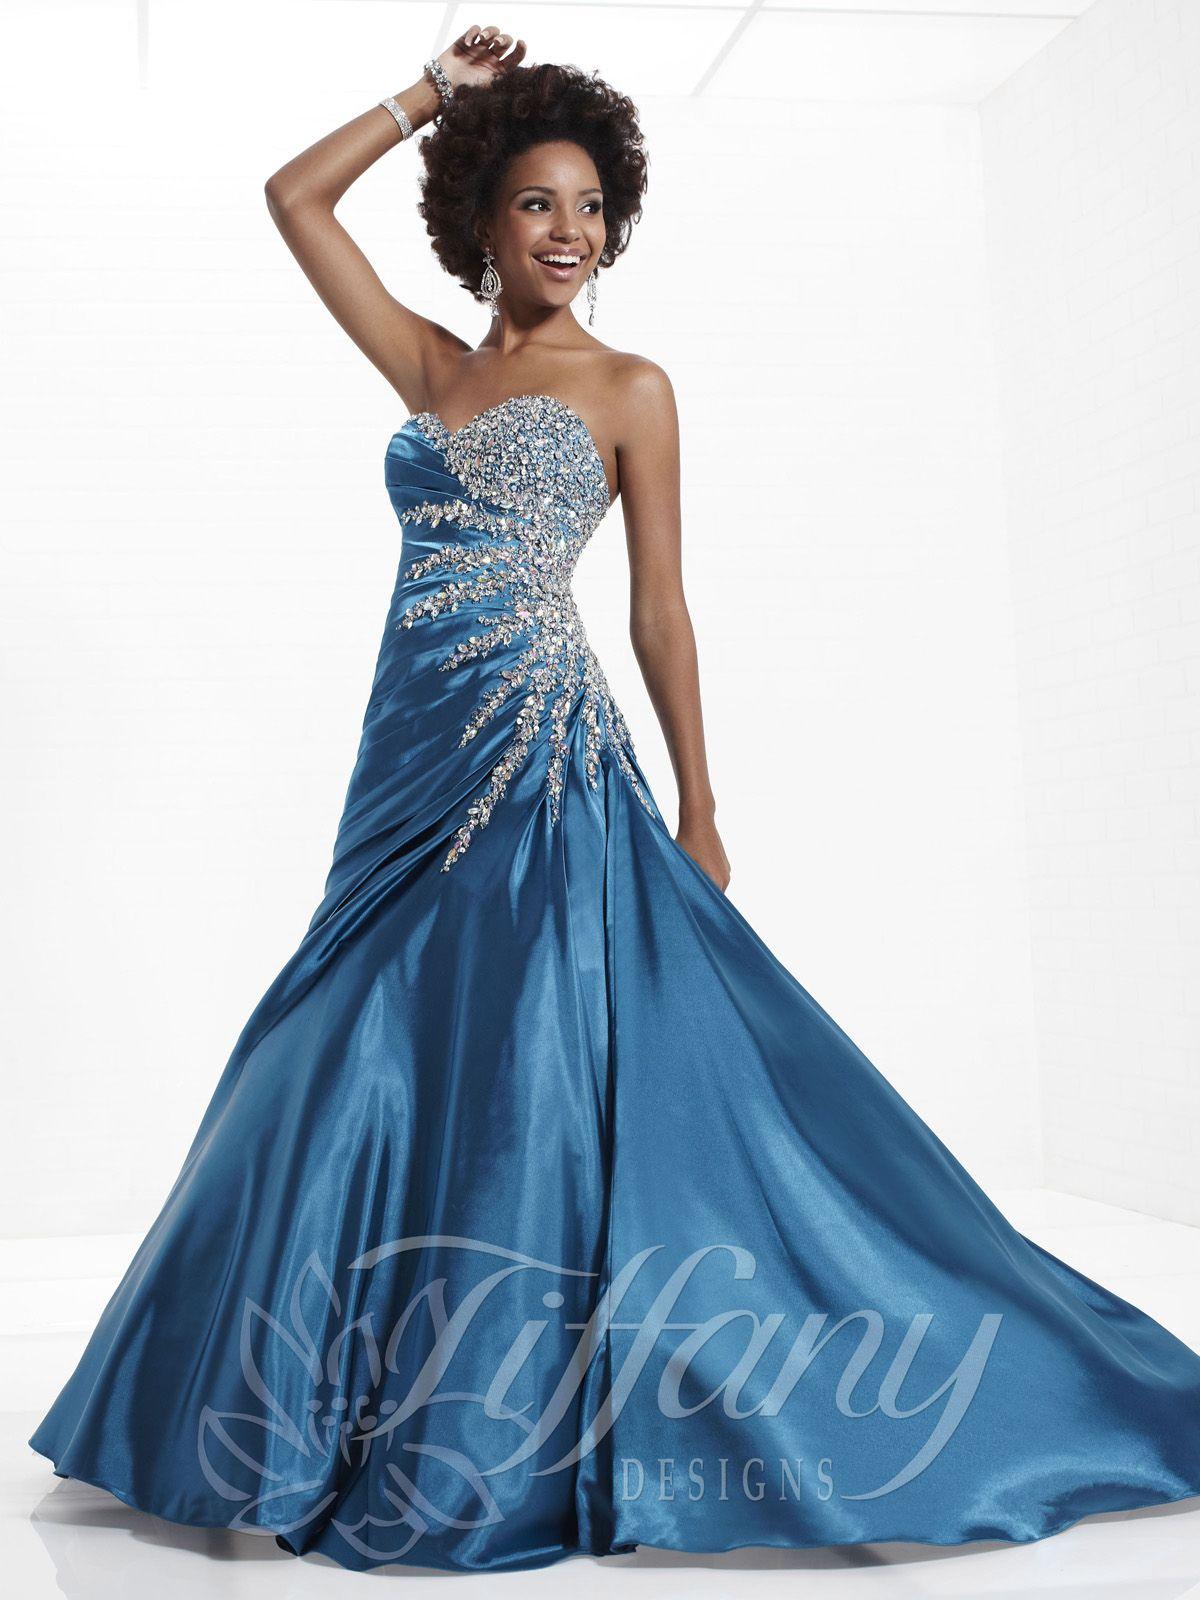 Unique Prom Dress Shops In Charlotte Nc Model - All Wedding Dresses ...